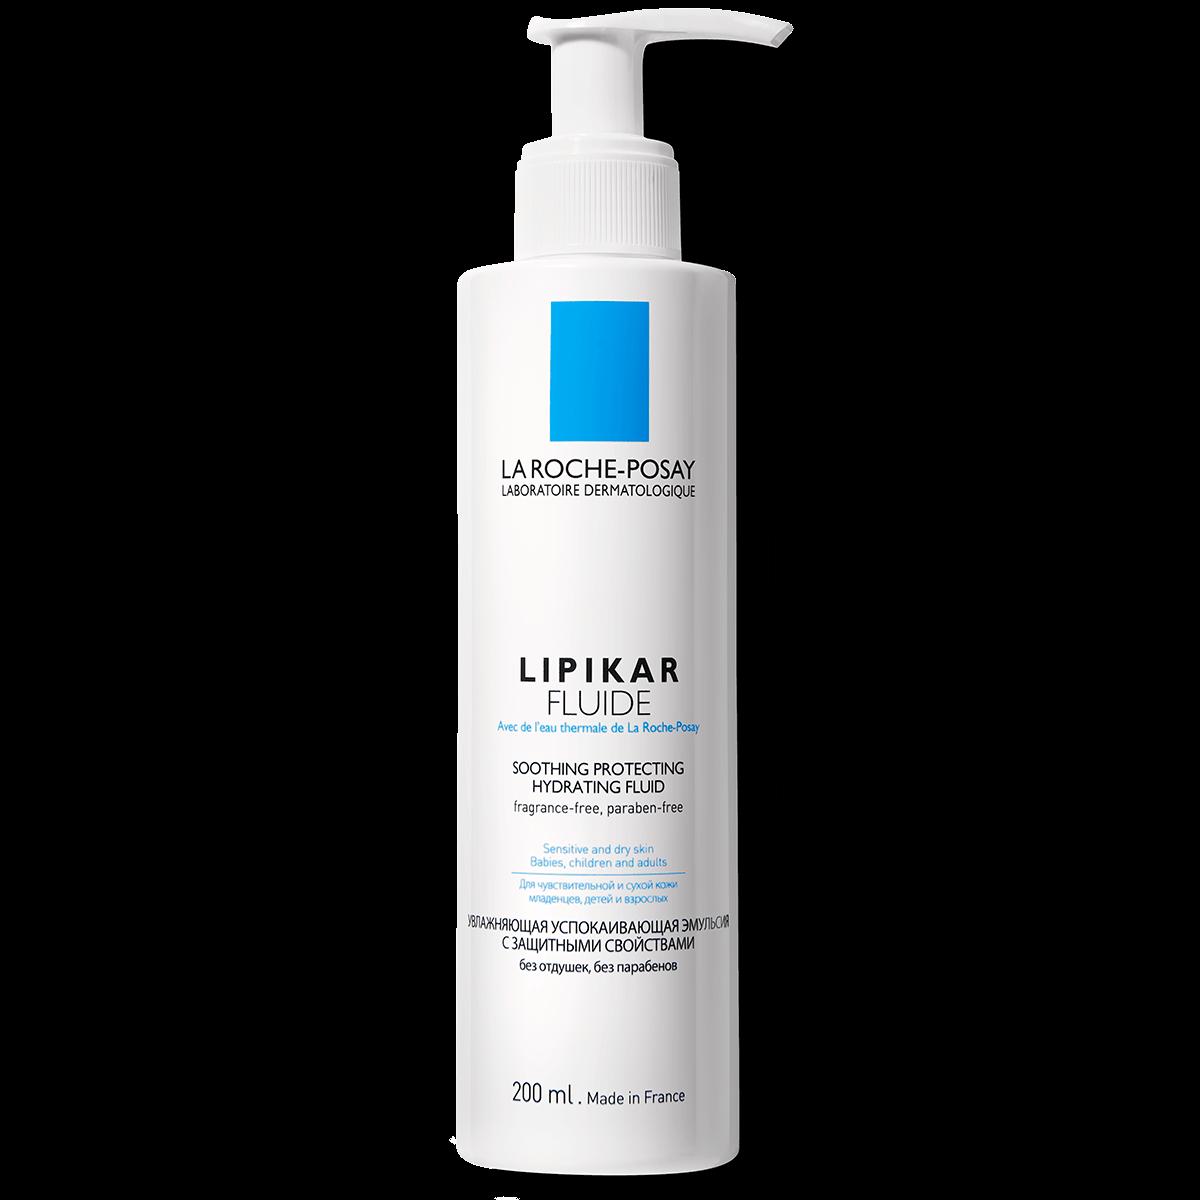 La Roche Posay ProductPage Eczema Lipikar Fluide 200ml 3337872420603 F